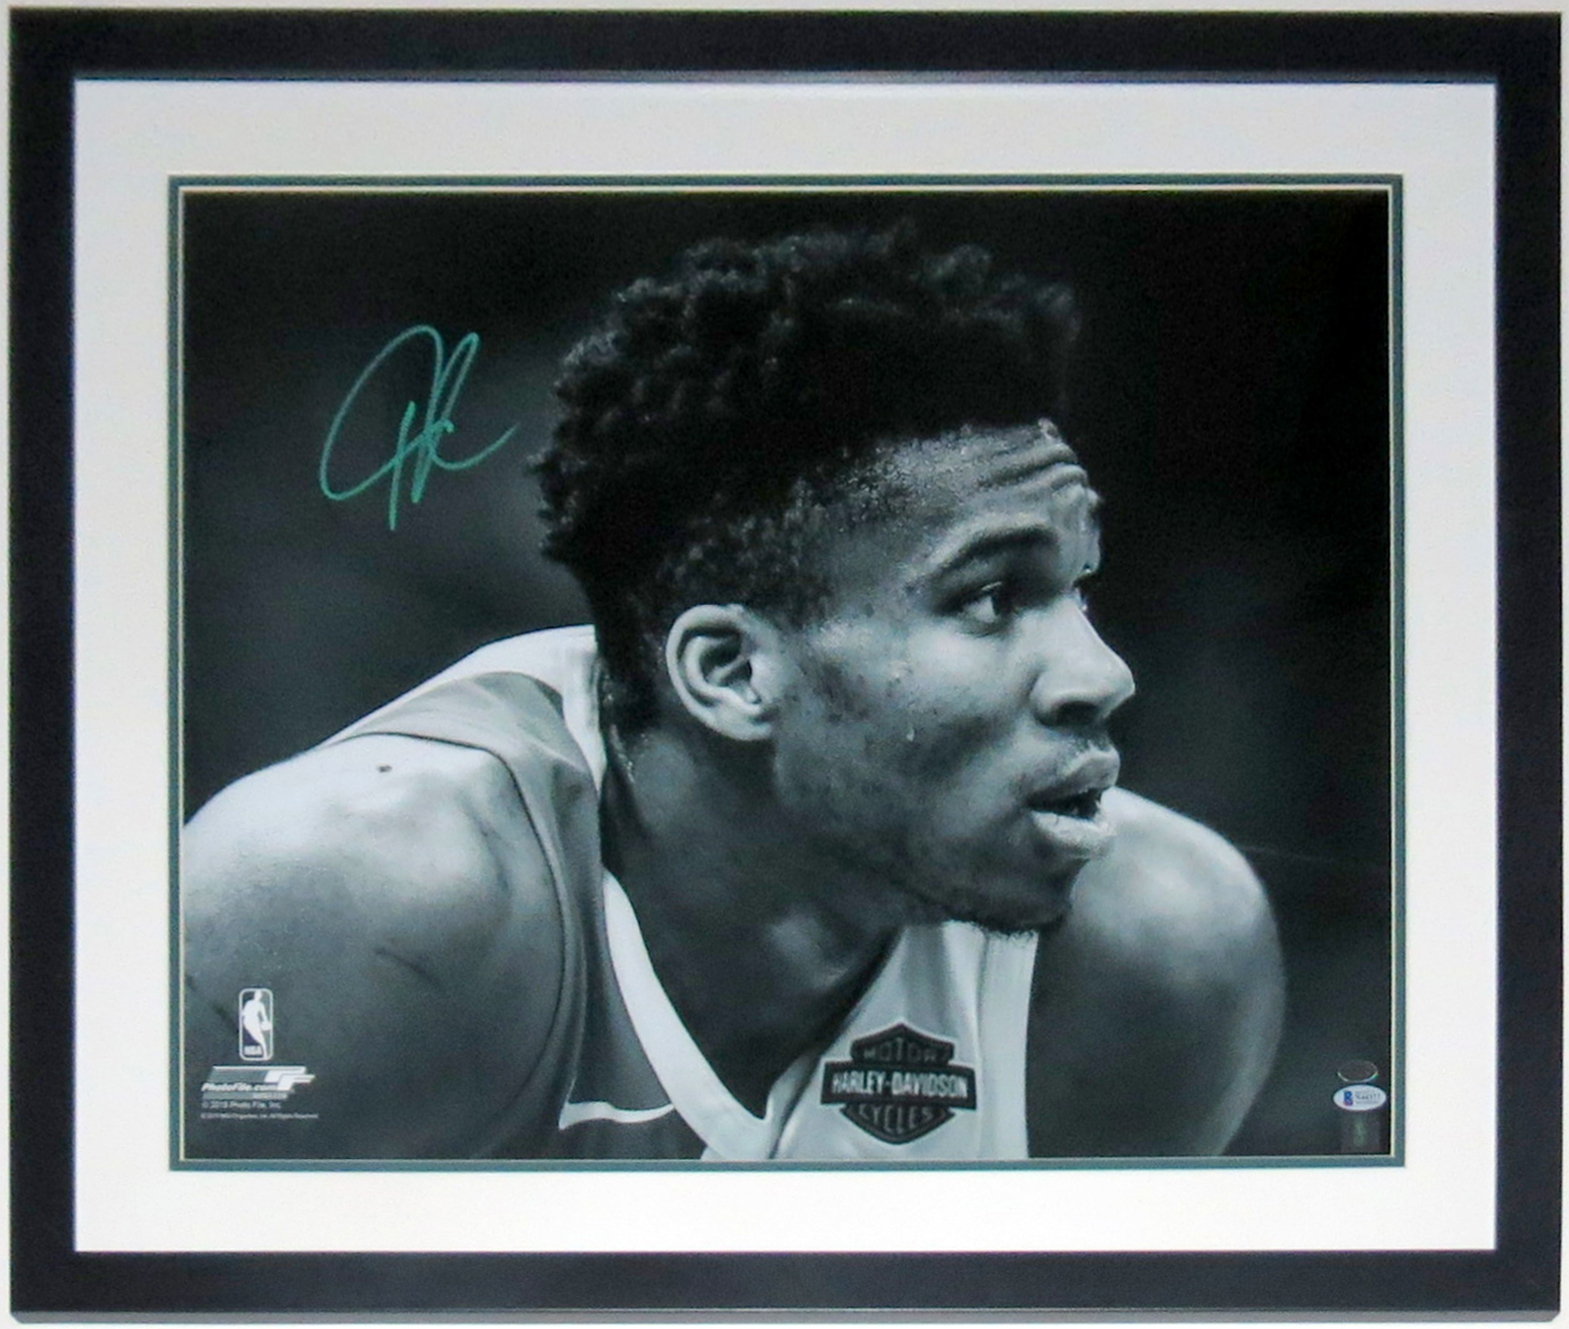 Giannis Antetokounmpo Signed Milwaukee Bucks 18x24 Photo - Beckett Authentication Services BAS COA -Professionally Framed